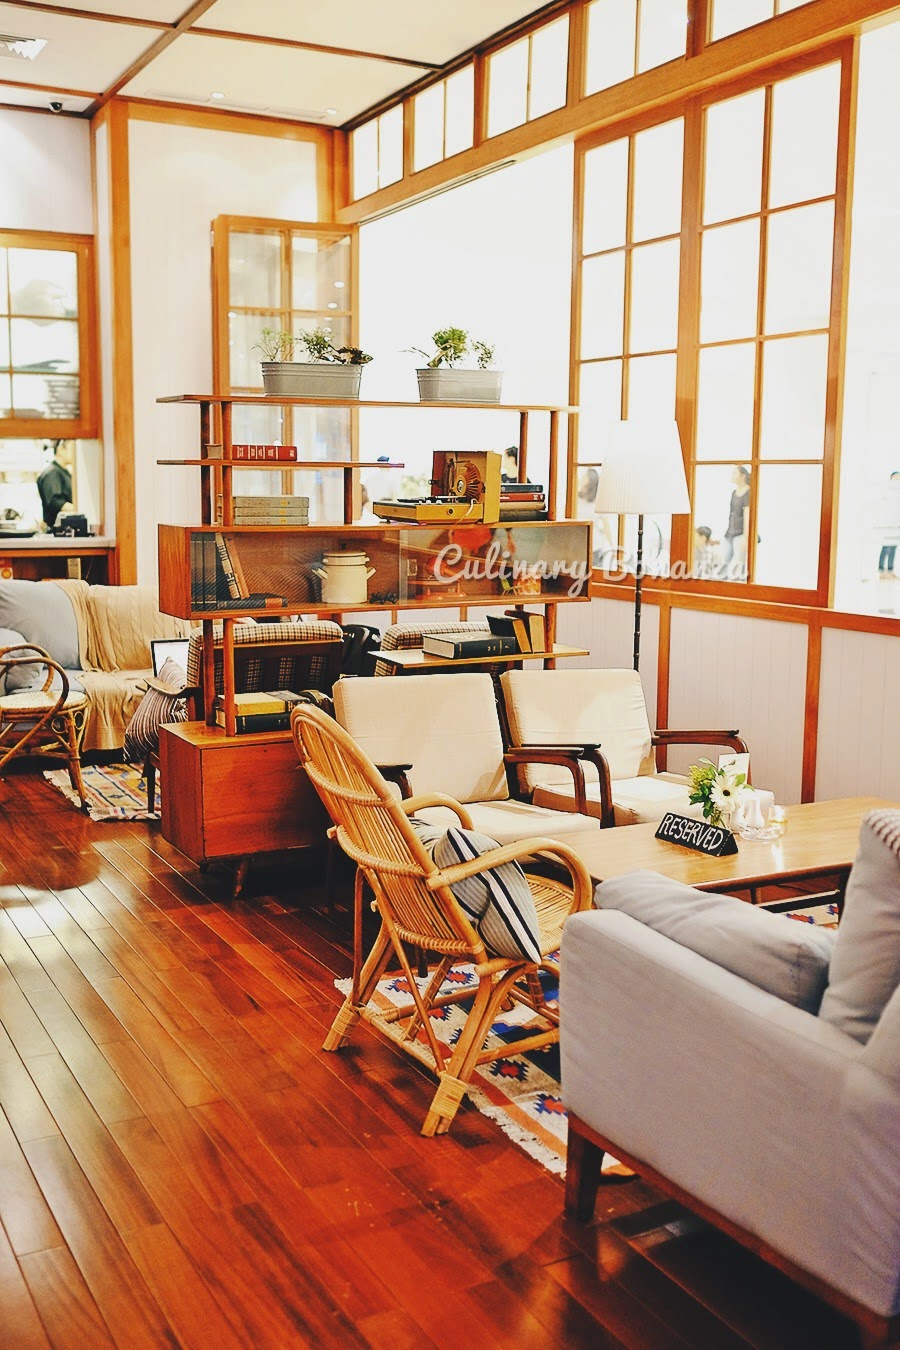 Benedict Jakarta (source: www.culinarybonanza.com)